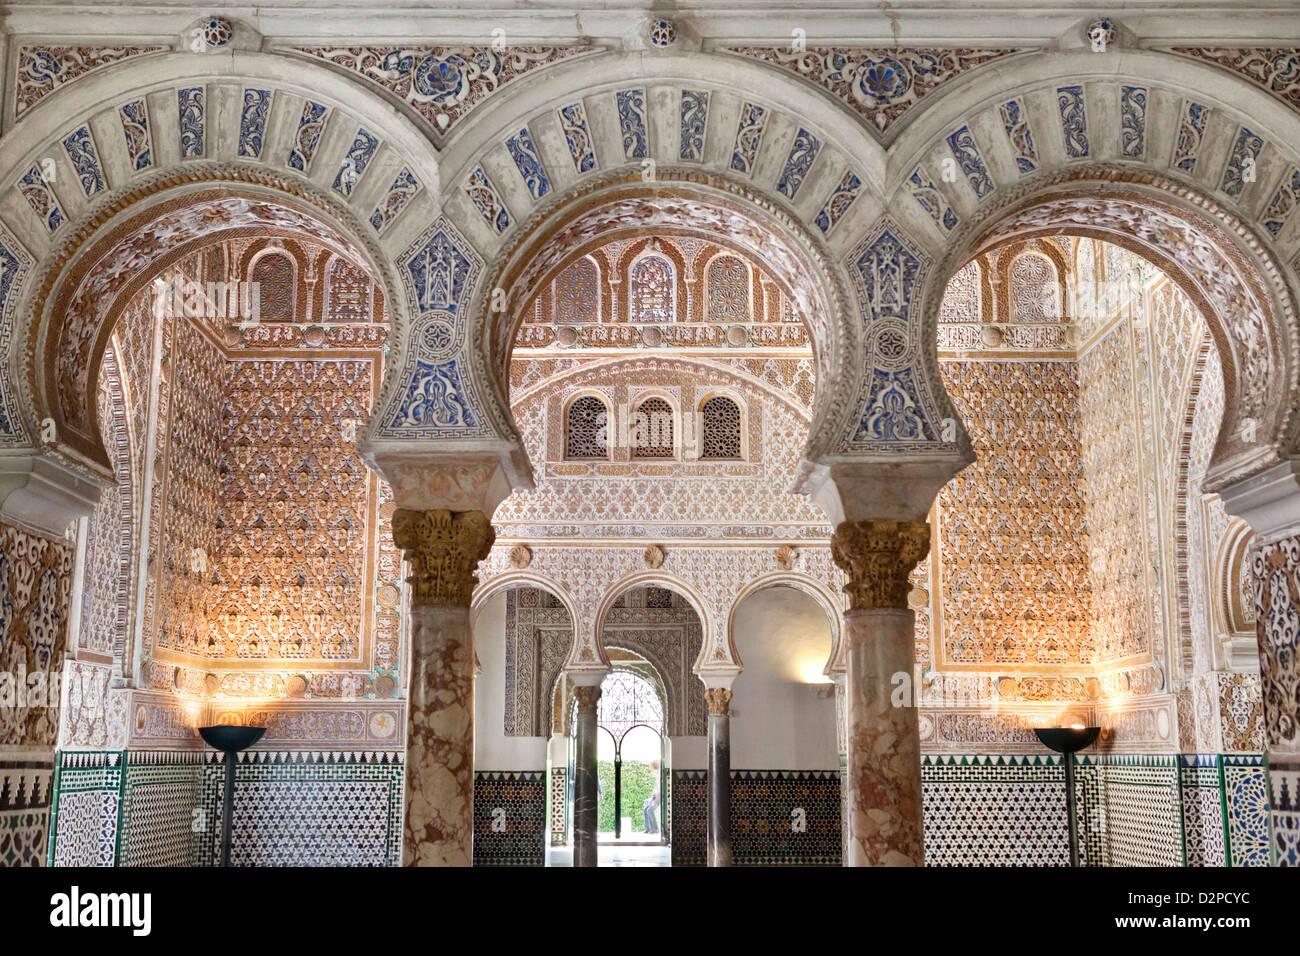 Seville Alcazar. Salon de Embajadores - Stock Image